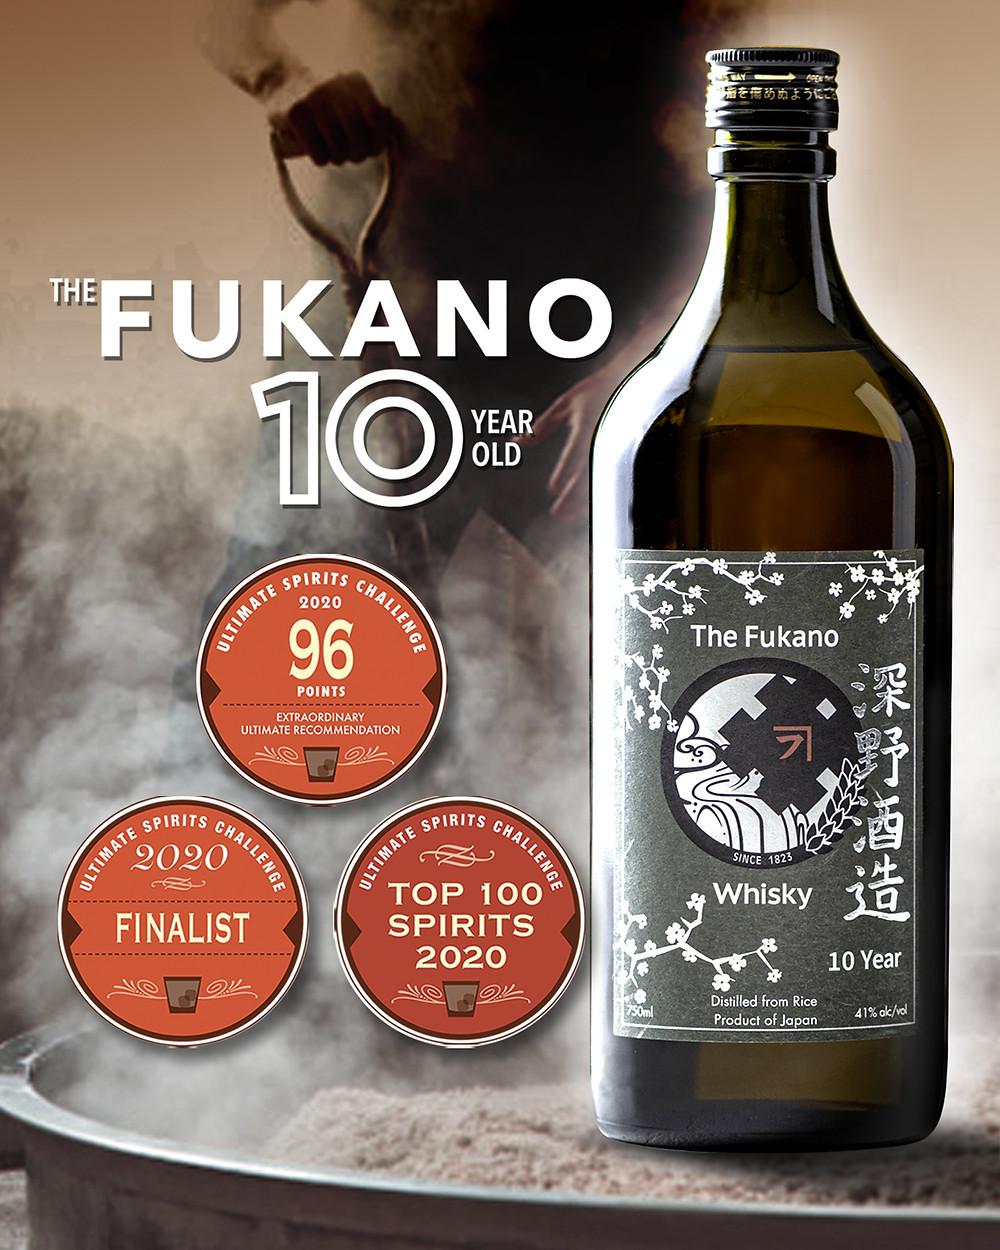 Award winning Fukano 10 Year Old